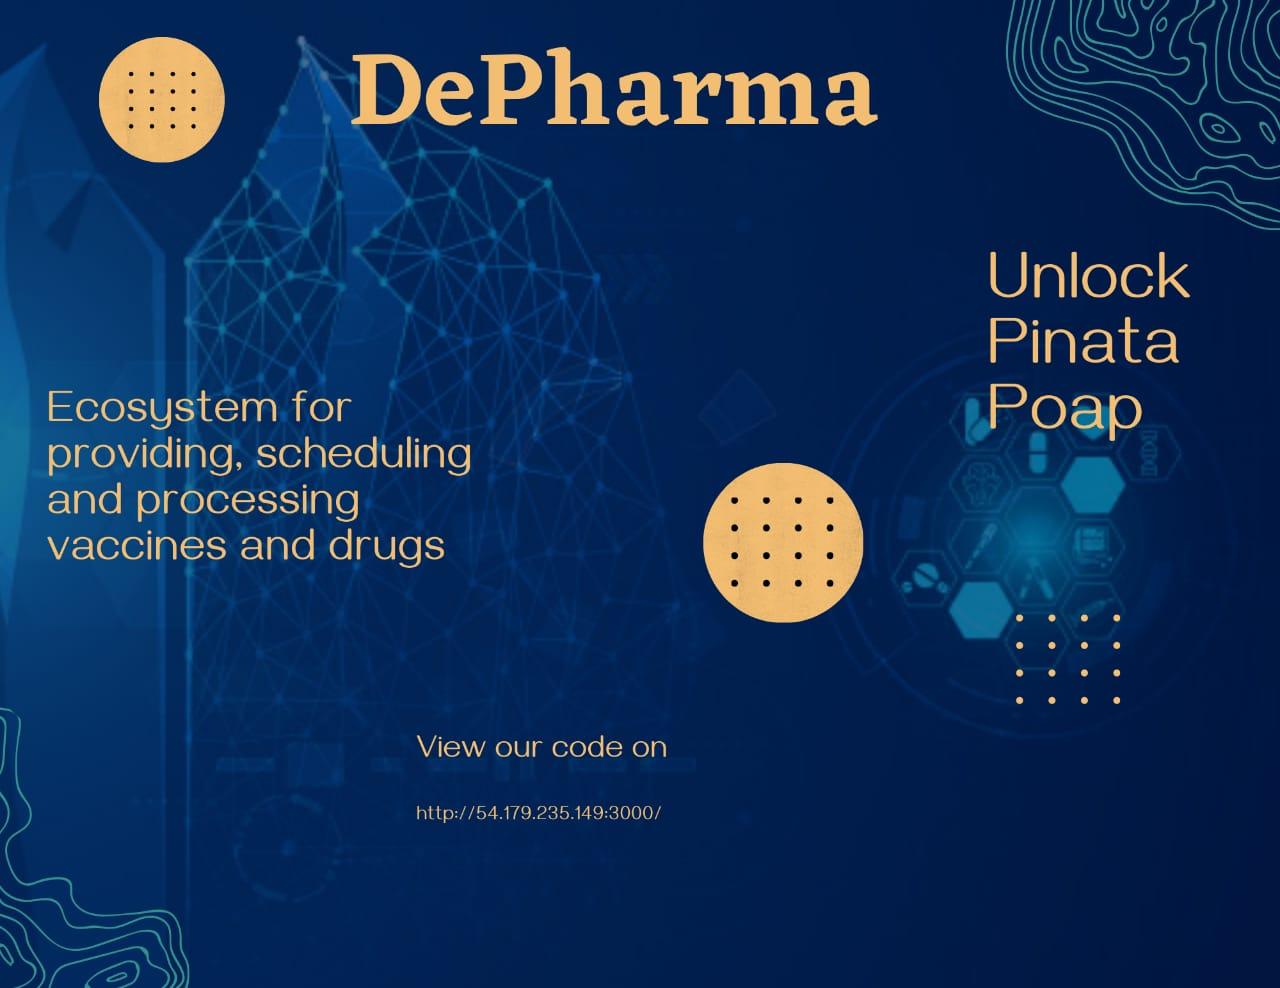 DePharma showcase